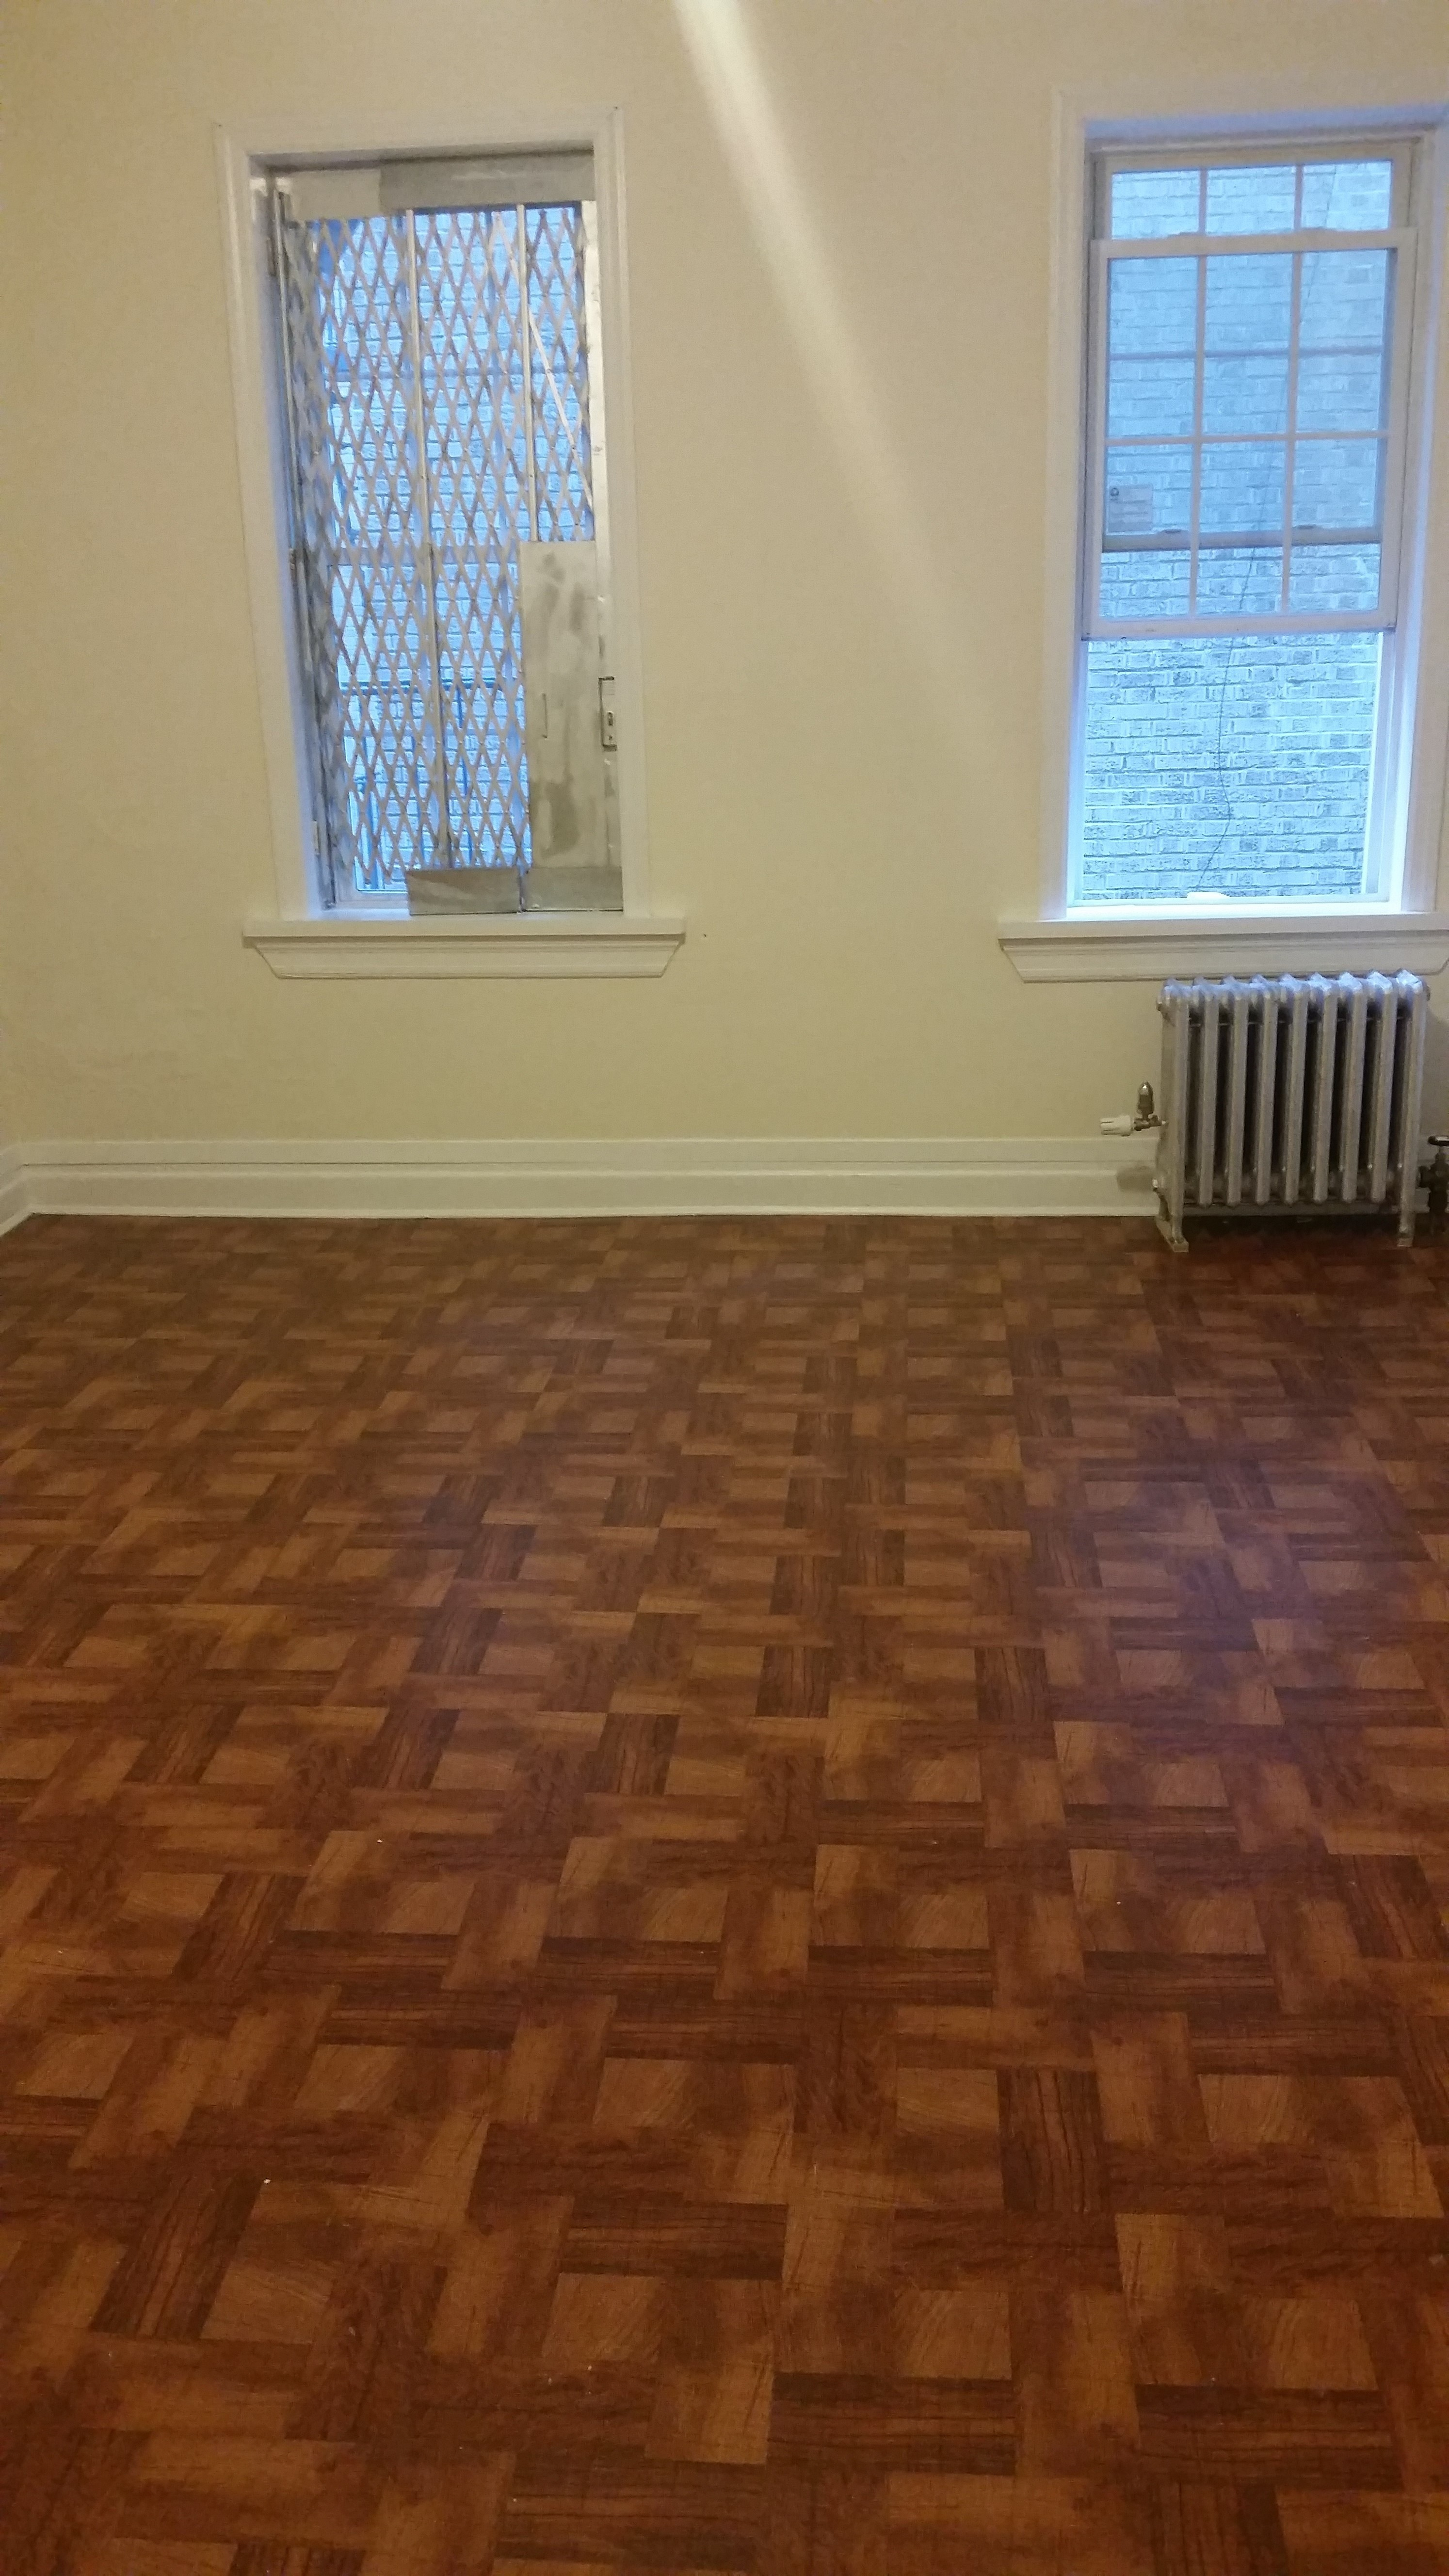 2500 Arthur Ave 3c Bronx Ny 10458 2 Bedroom Apartment For Rent Padmapper